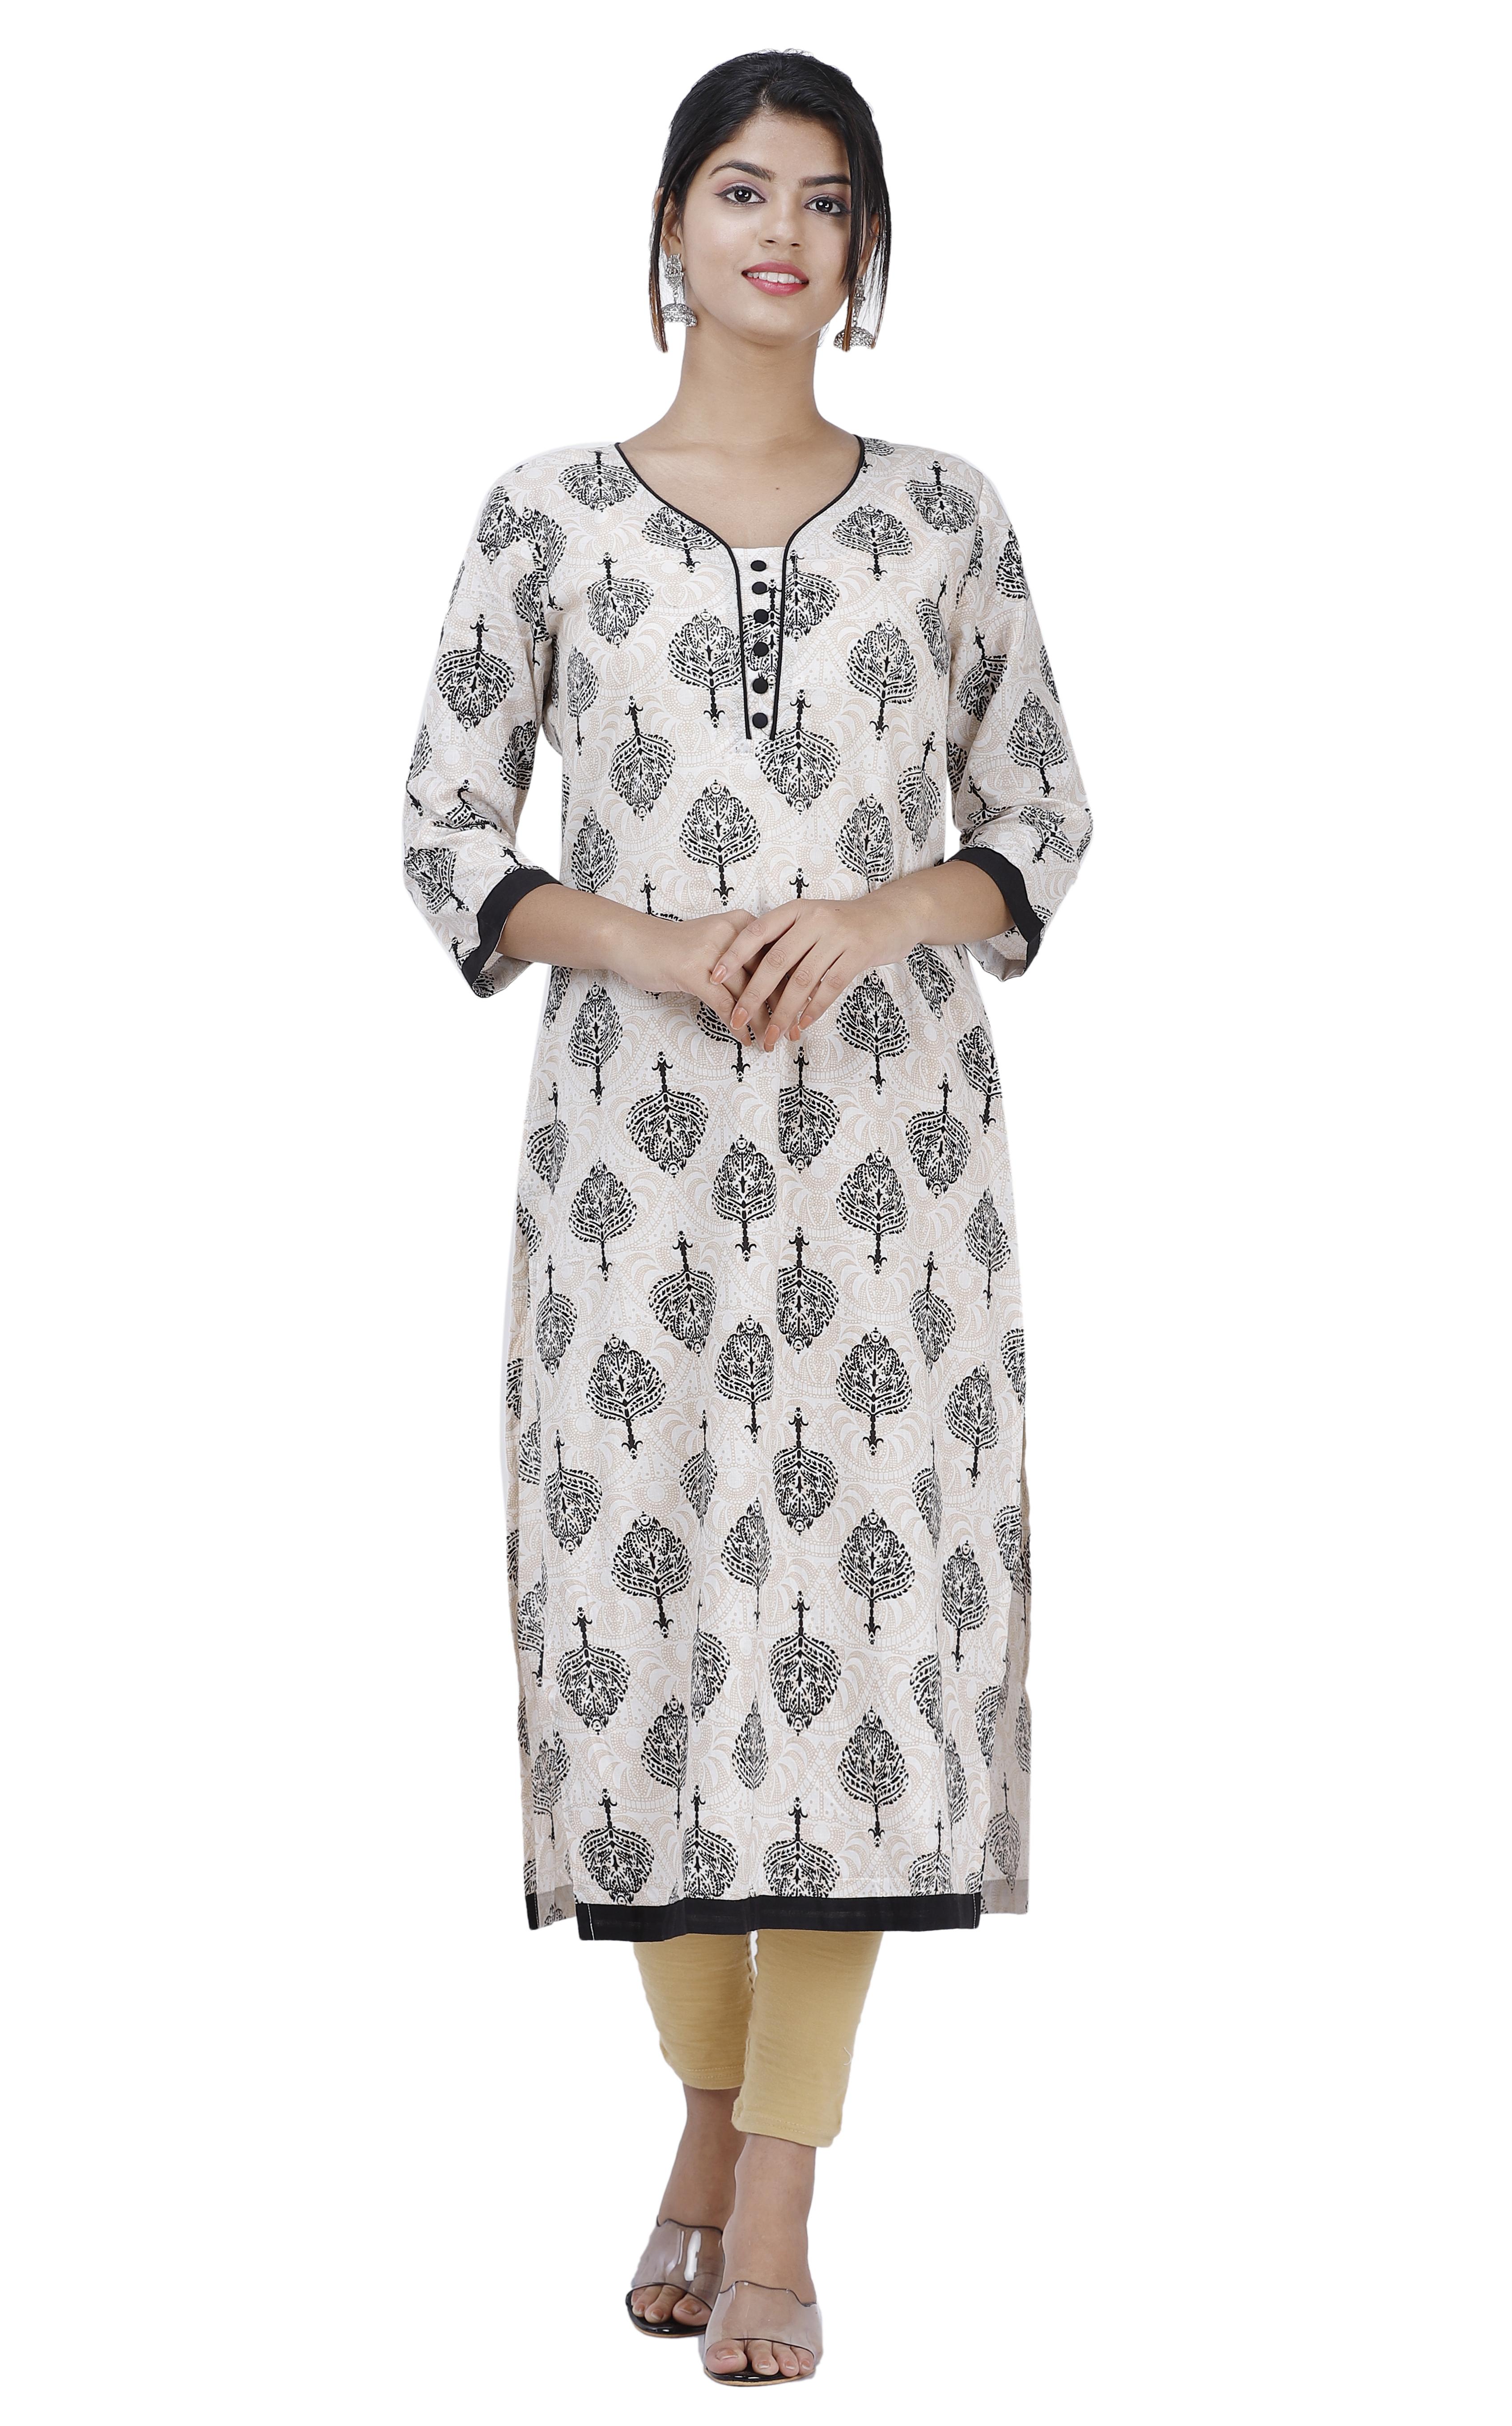 Maya Women Ethnic Wear Cotton Kurta Straight 3/4 Sleeve (Off-White & Black)